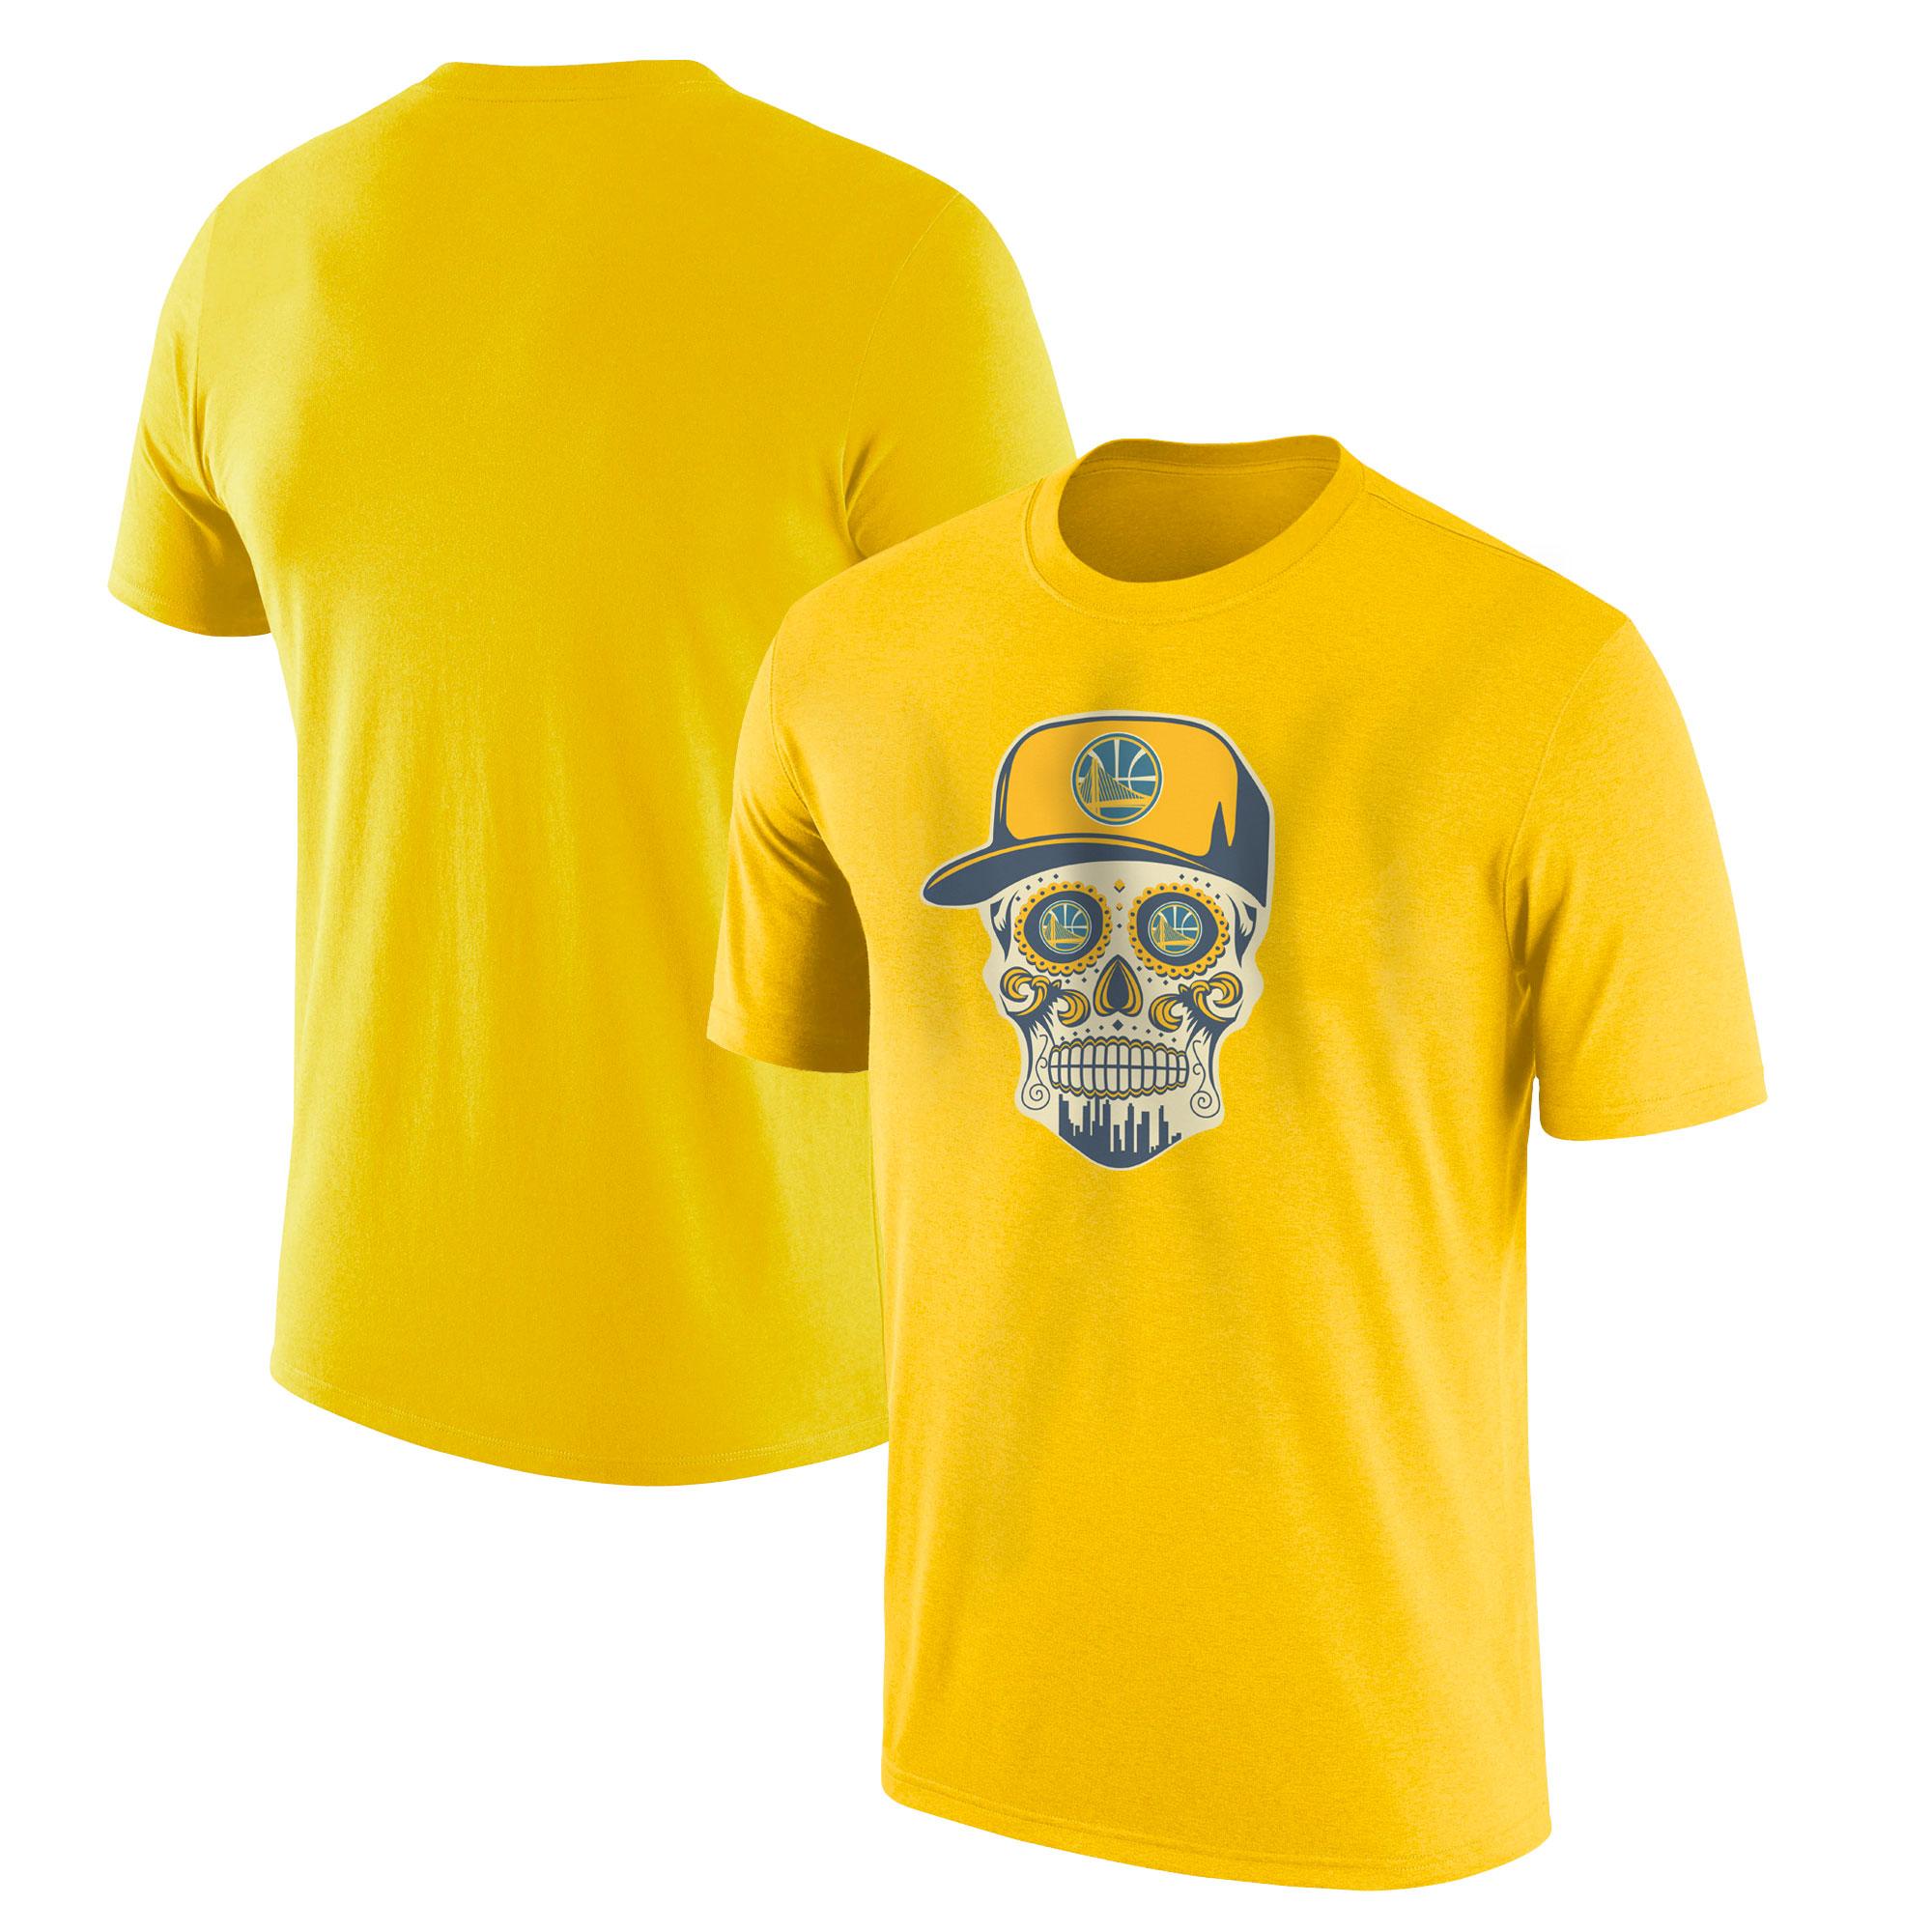 Warriors Skull Tshirt (TSH-YLW-NP-452-NBA-GSW-SKULL)